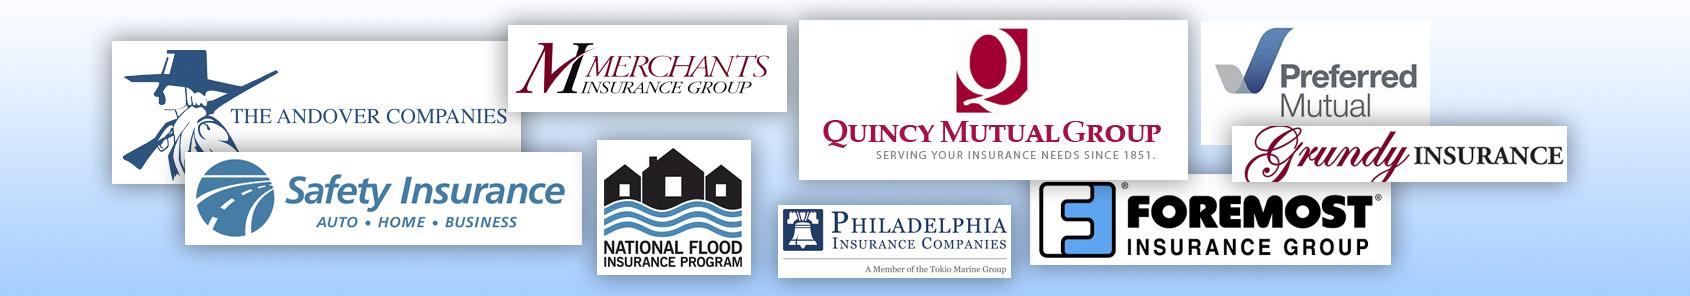 Merrimack Mutual Fire Insurance Company: Board Committees ...